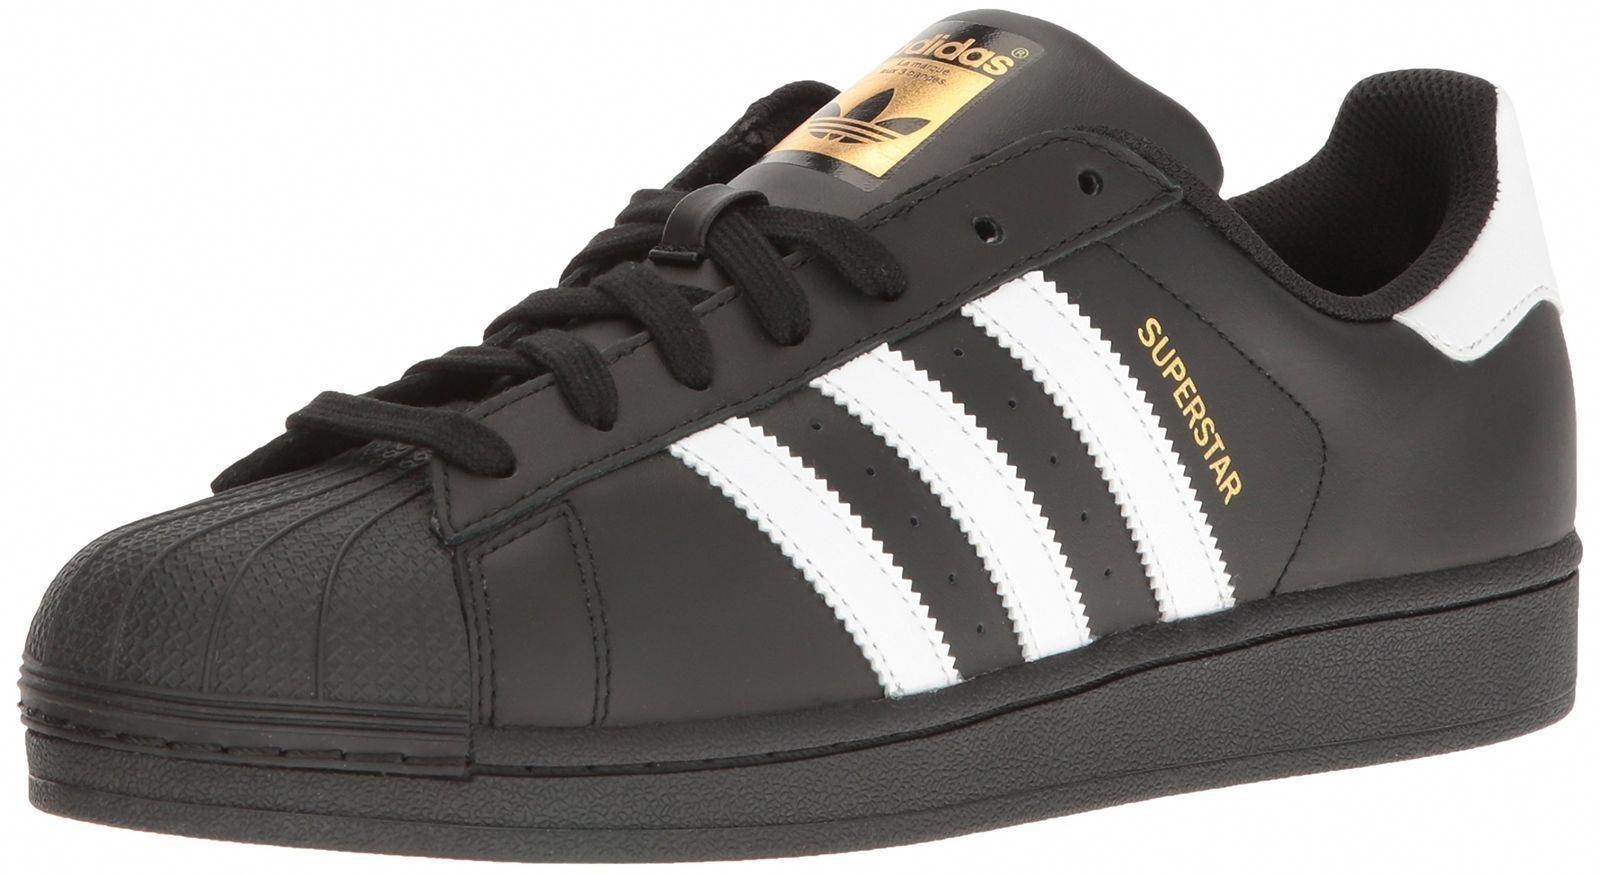 0b8bd022b06766 adidas Originals Men s Superstar Sneaker GOLD TONGUE  MensFastionSneakers